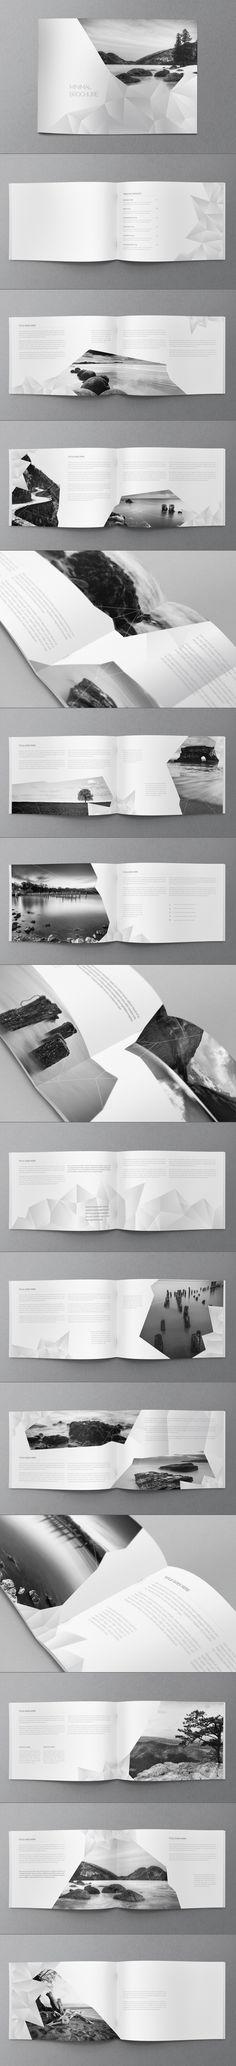 White Minimal Brochure by Abra Design, via Behance